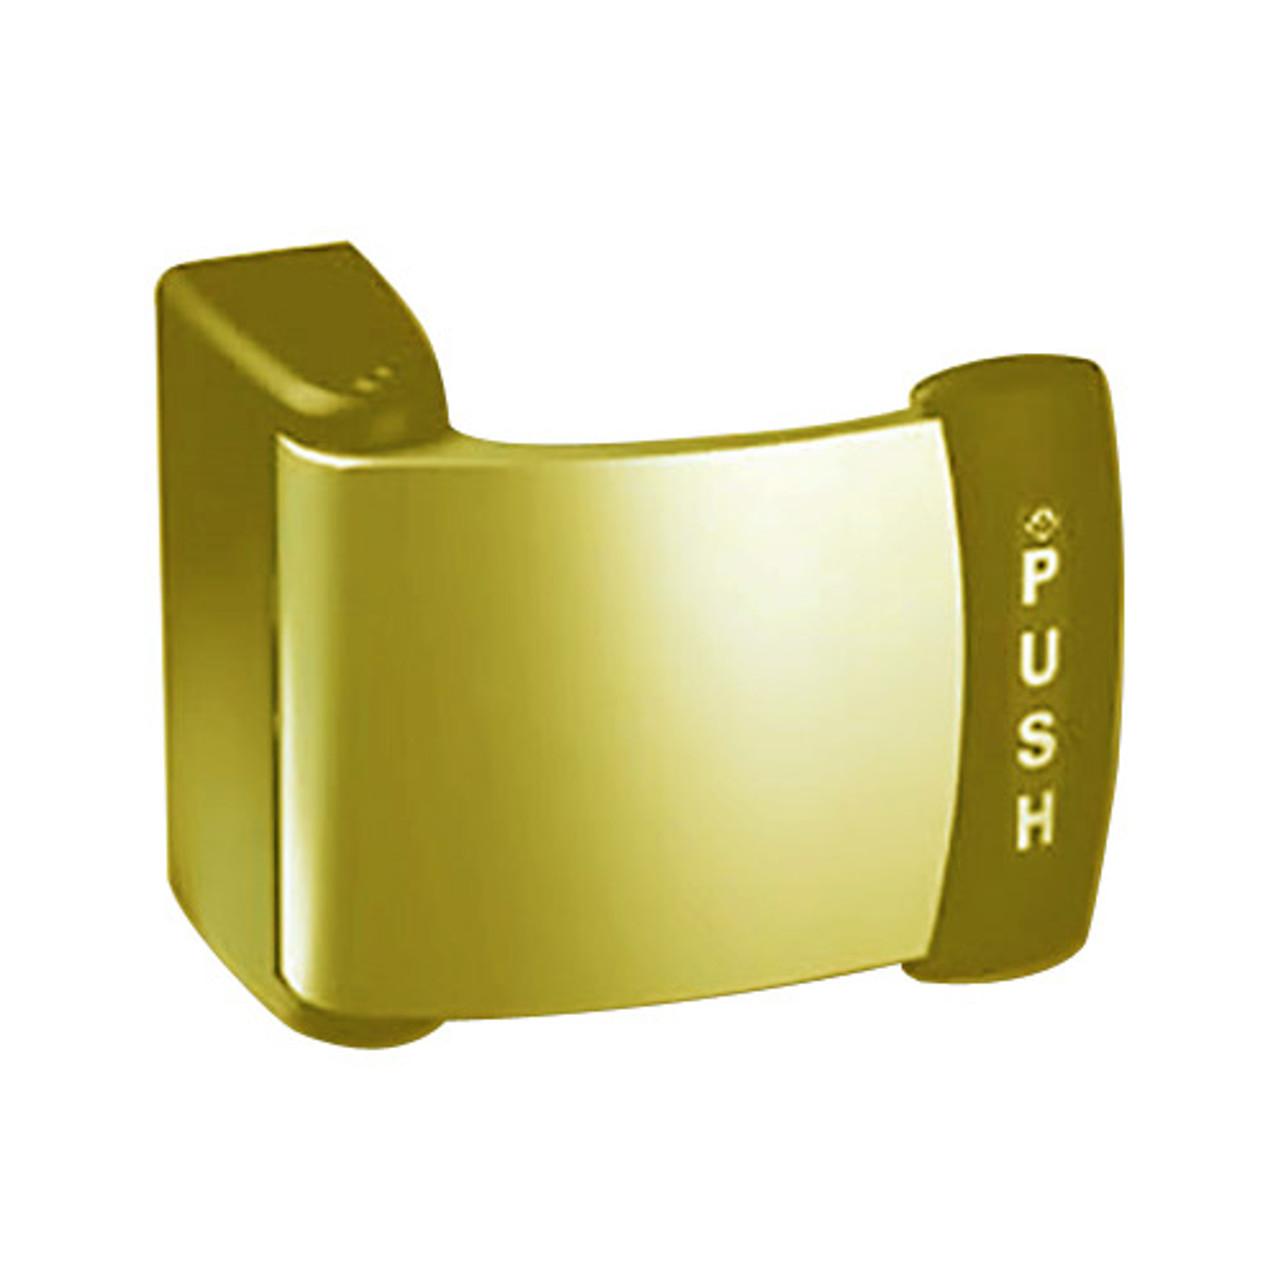 4591-12-03-US3 Adams Rite Deadlatch Paddle in Bright Brass Finish